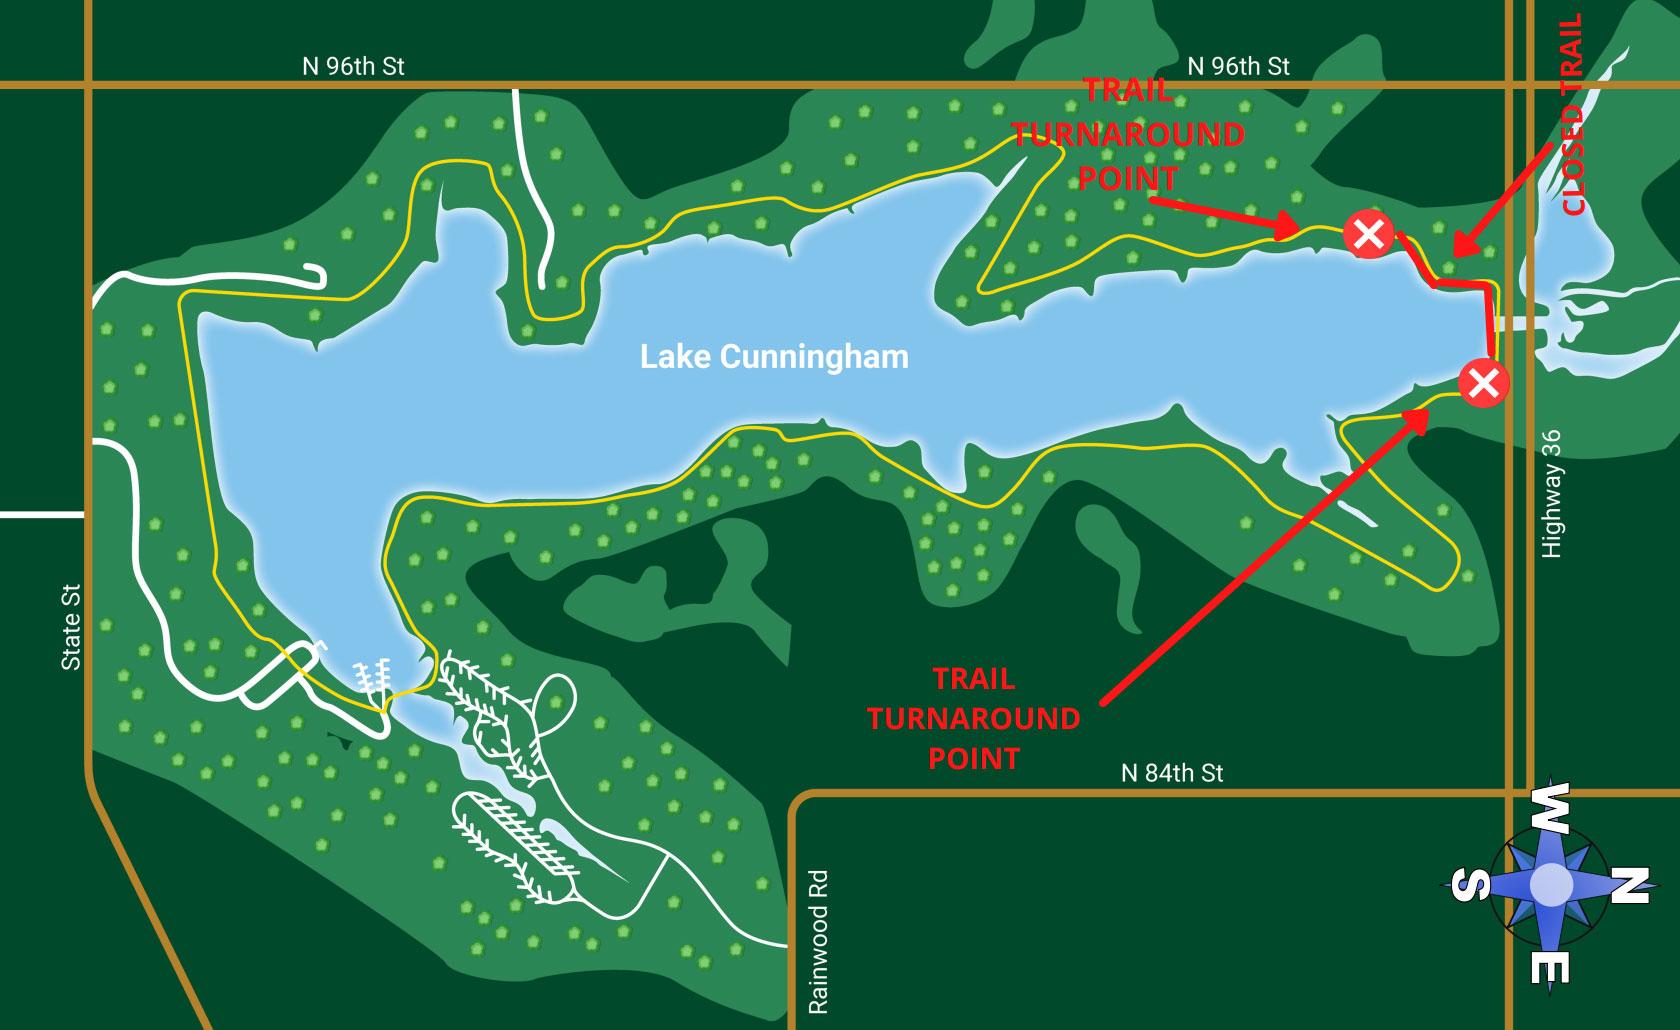 map indicating trail closure